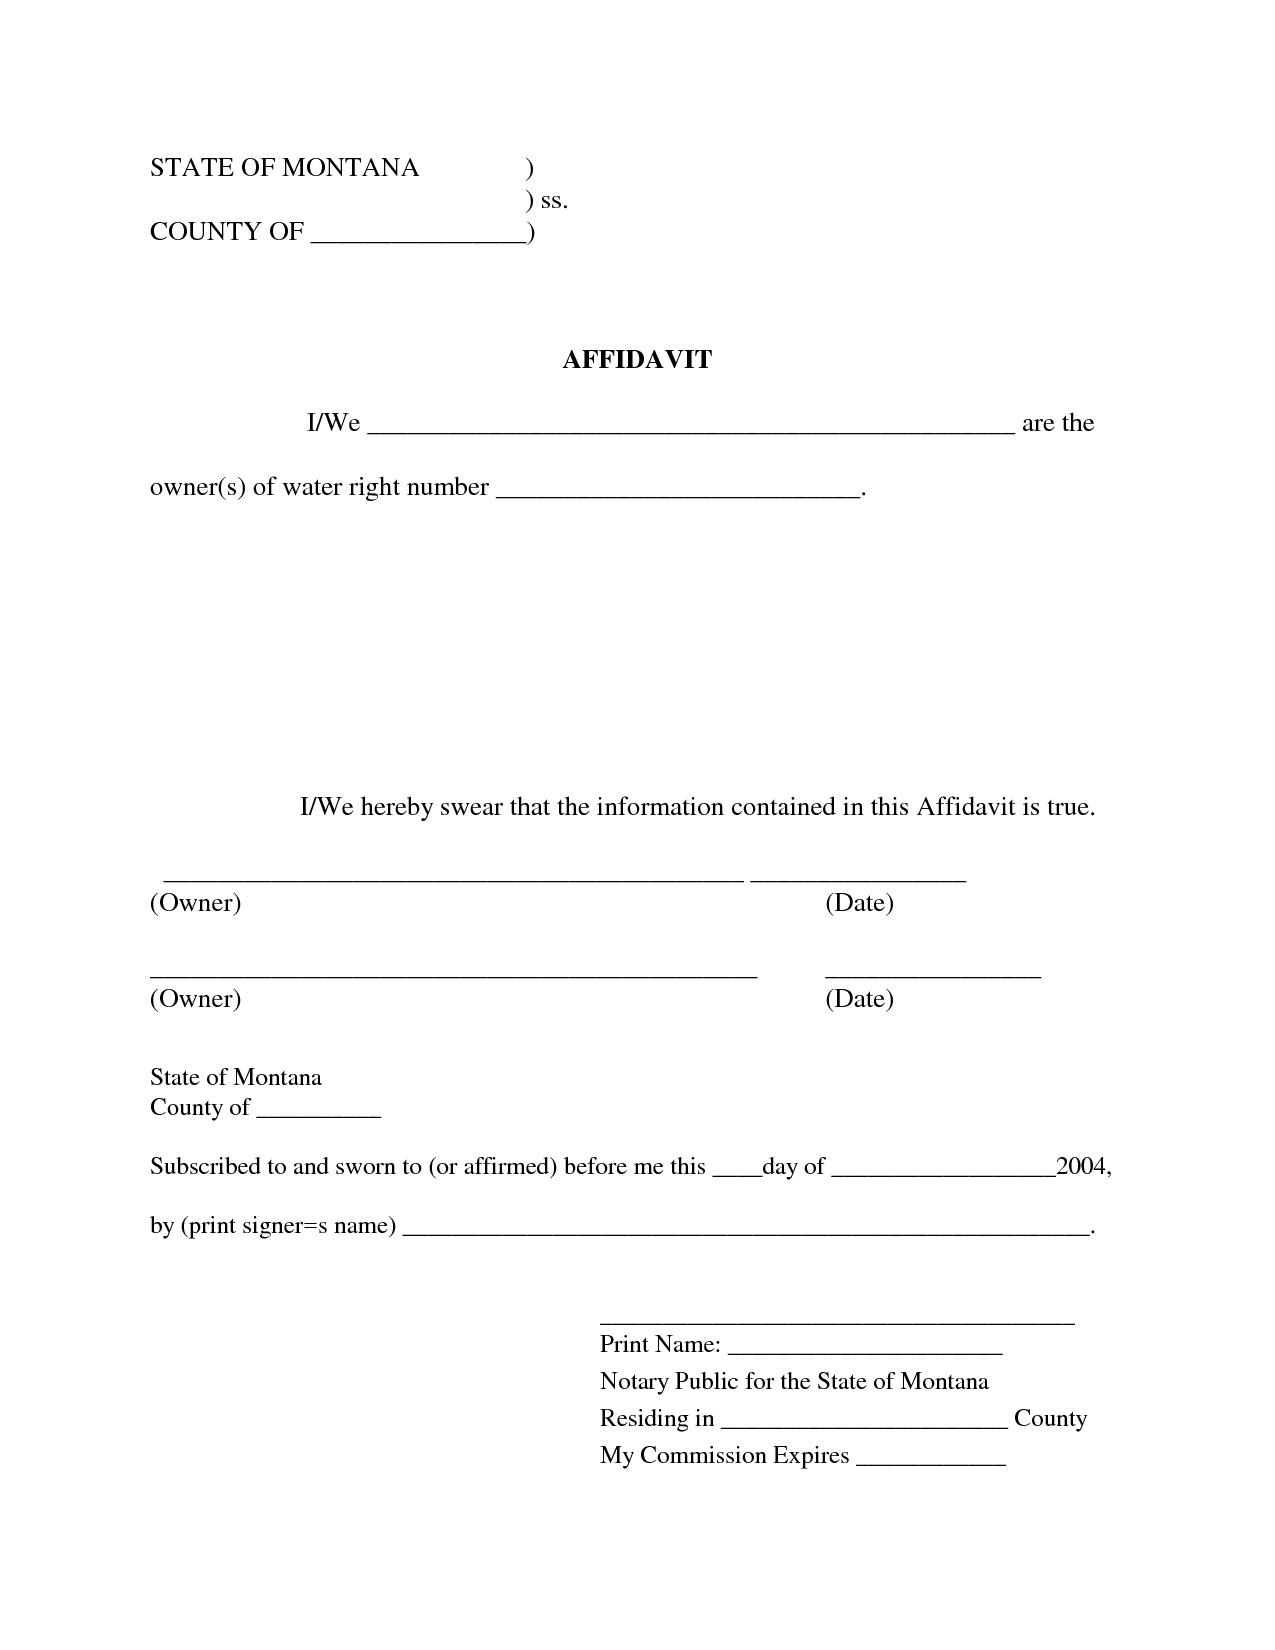 Affidavit Form Nevada Free – Free Affidavit Form Template